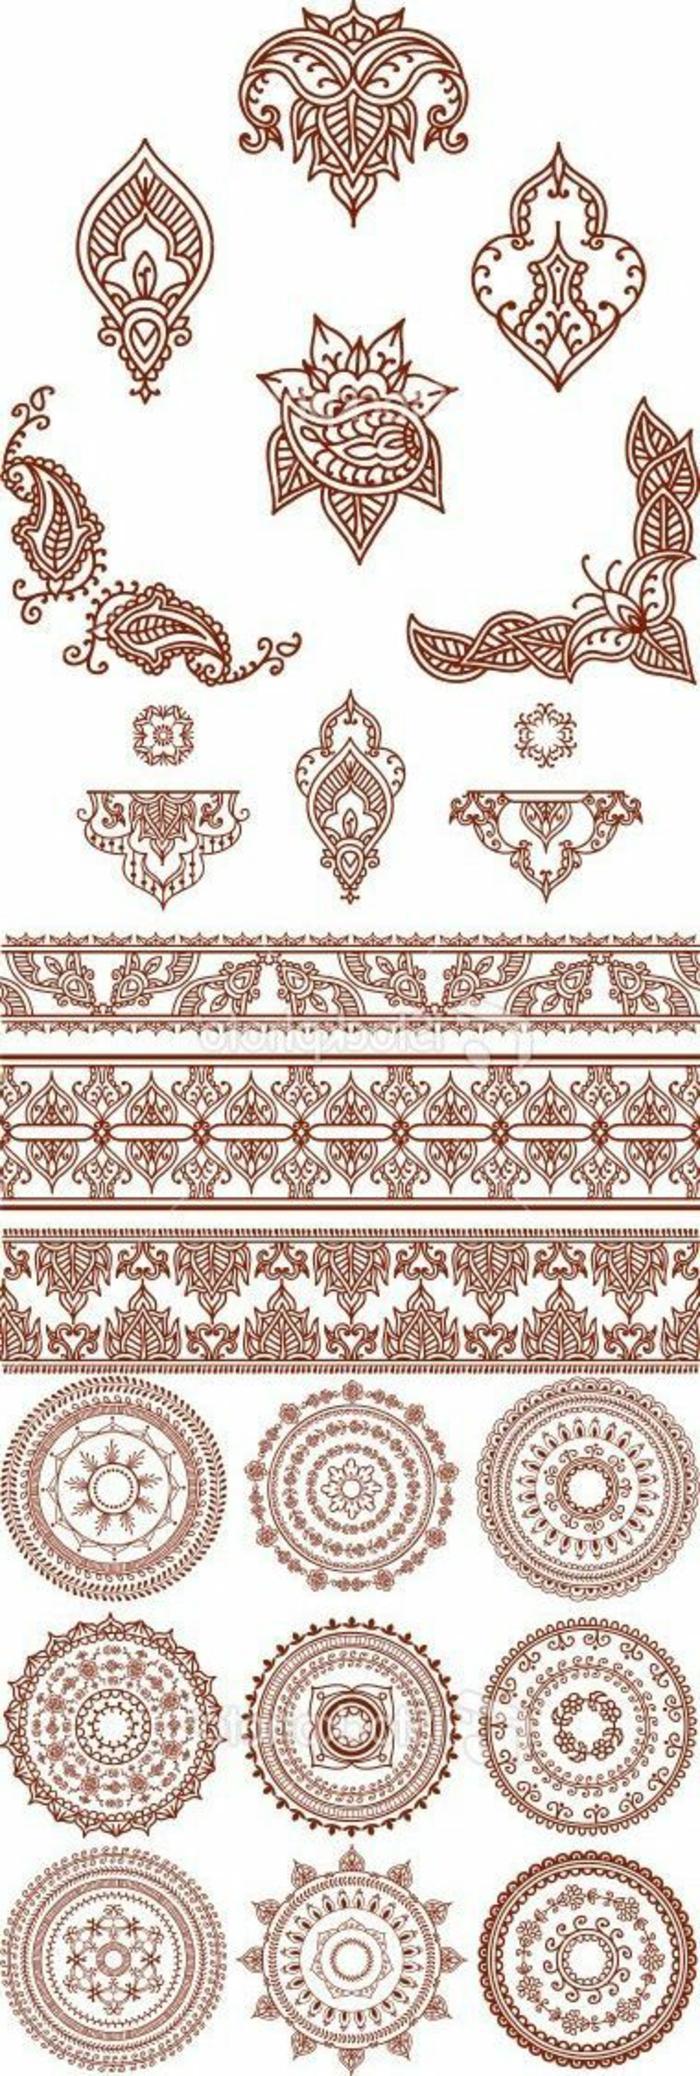 Henna Tattoo Muster für Mandala Tattoos, Armbandtattoos-Muster, ornamentale Tattoos Muster